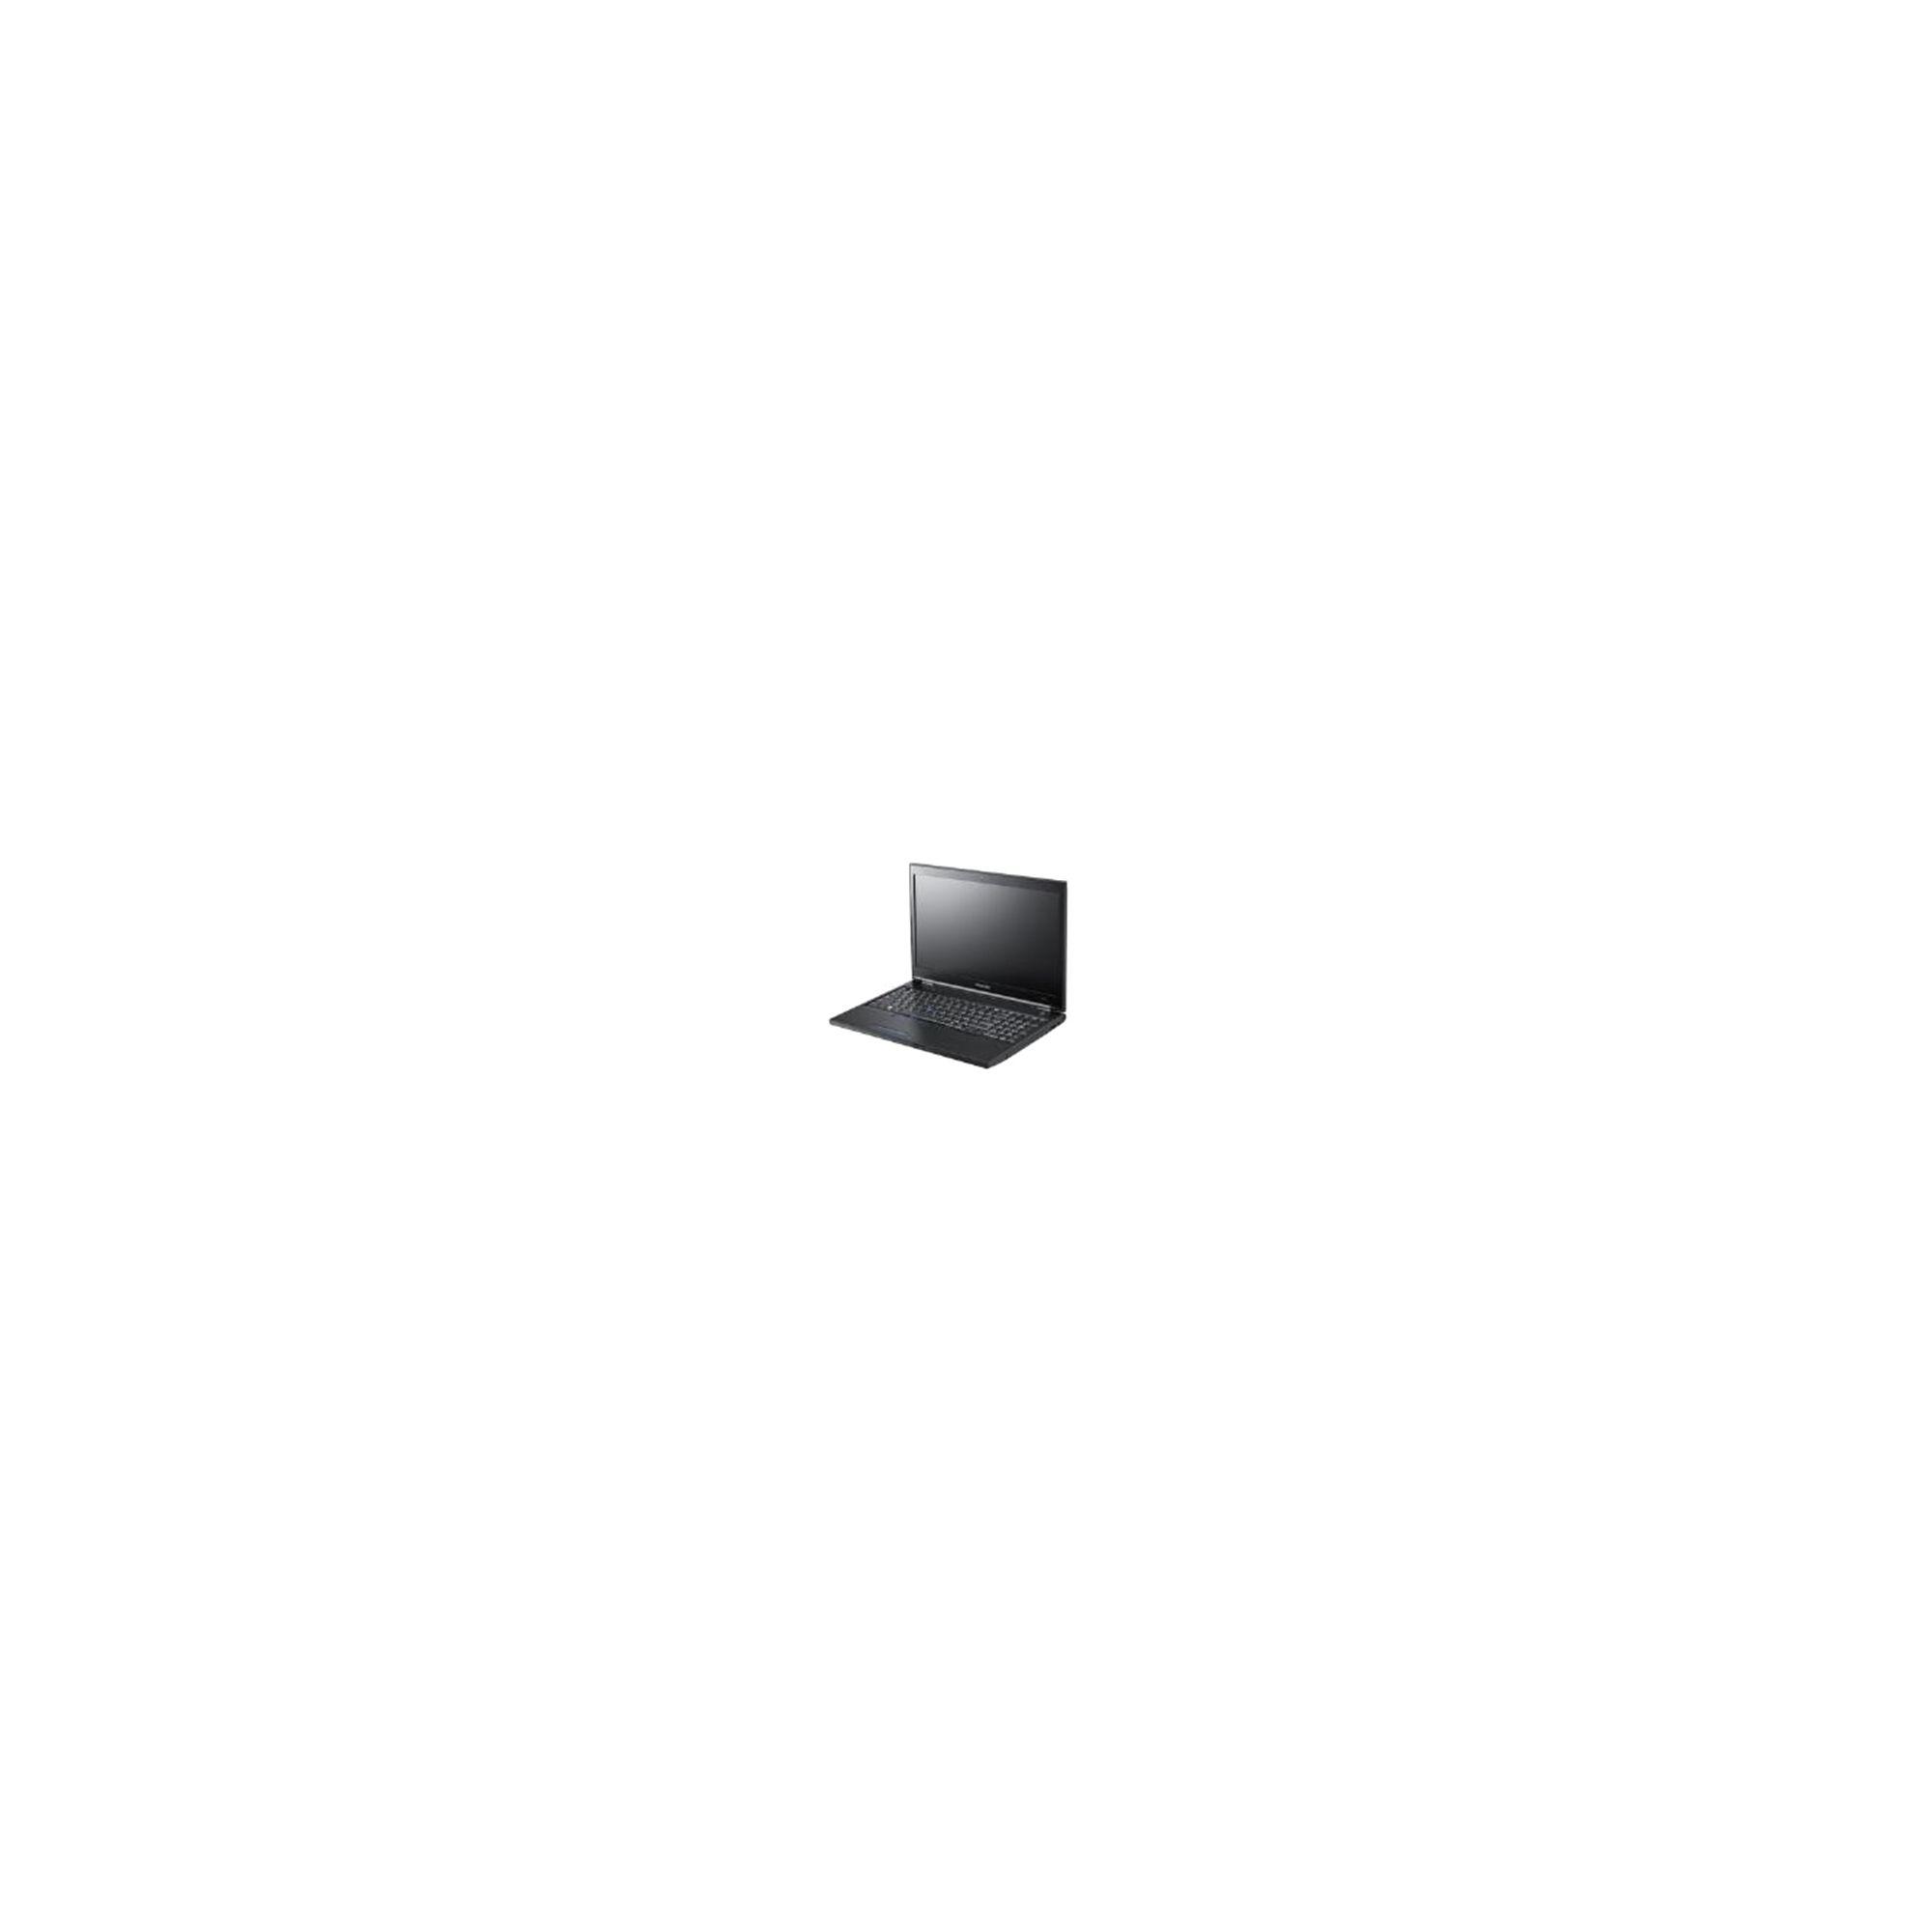 Samsung 400B5C (15.6 inch) Notebook PC Core i3 (3110M) 2.4GHz 4GB 500GB DVD-SuperMulti DL WLAN BT Webcam Windows 7 Pro 64-bit (Intel HD Graphics 4000) at Tesco Direct